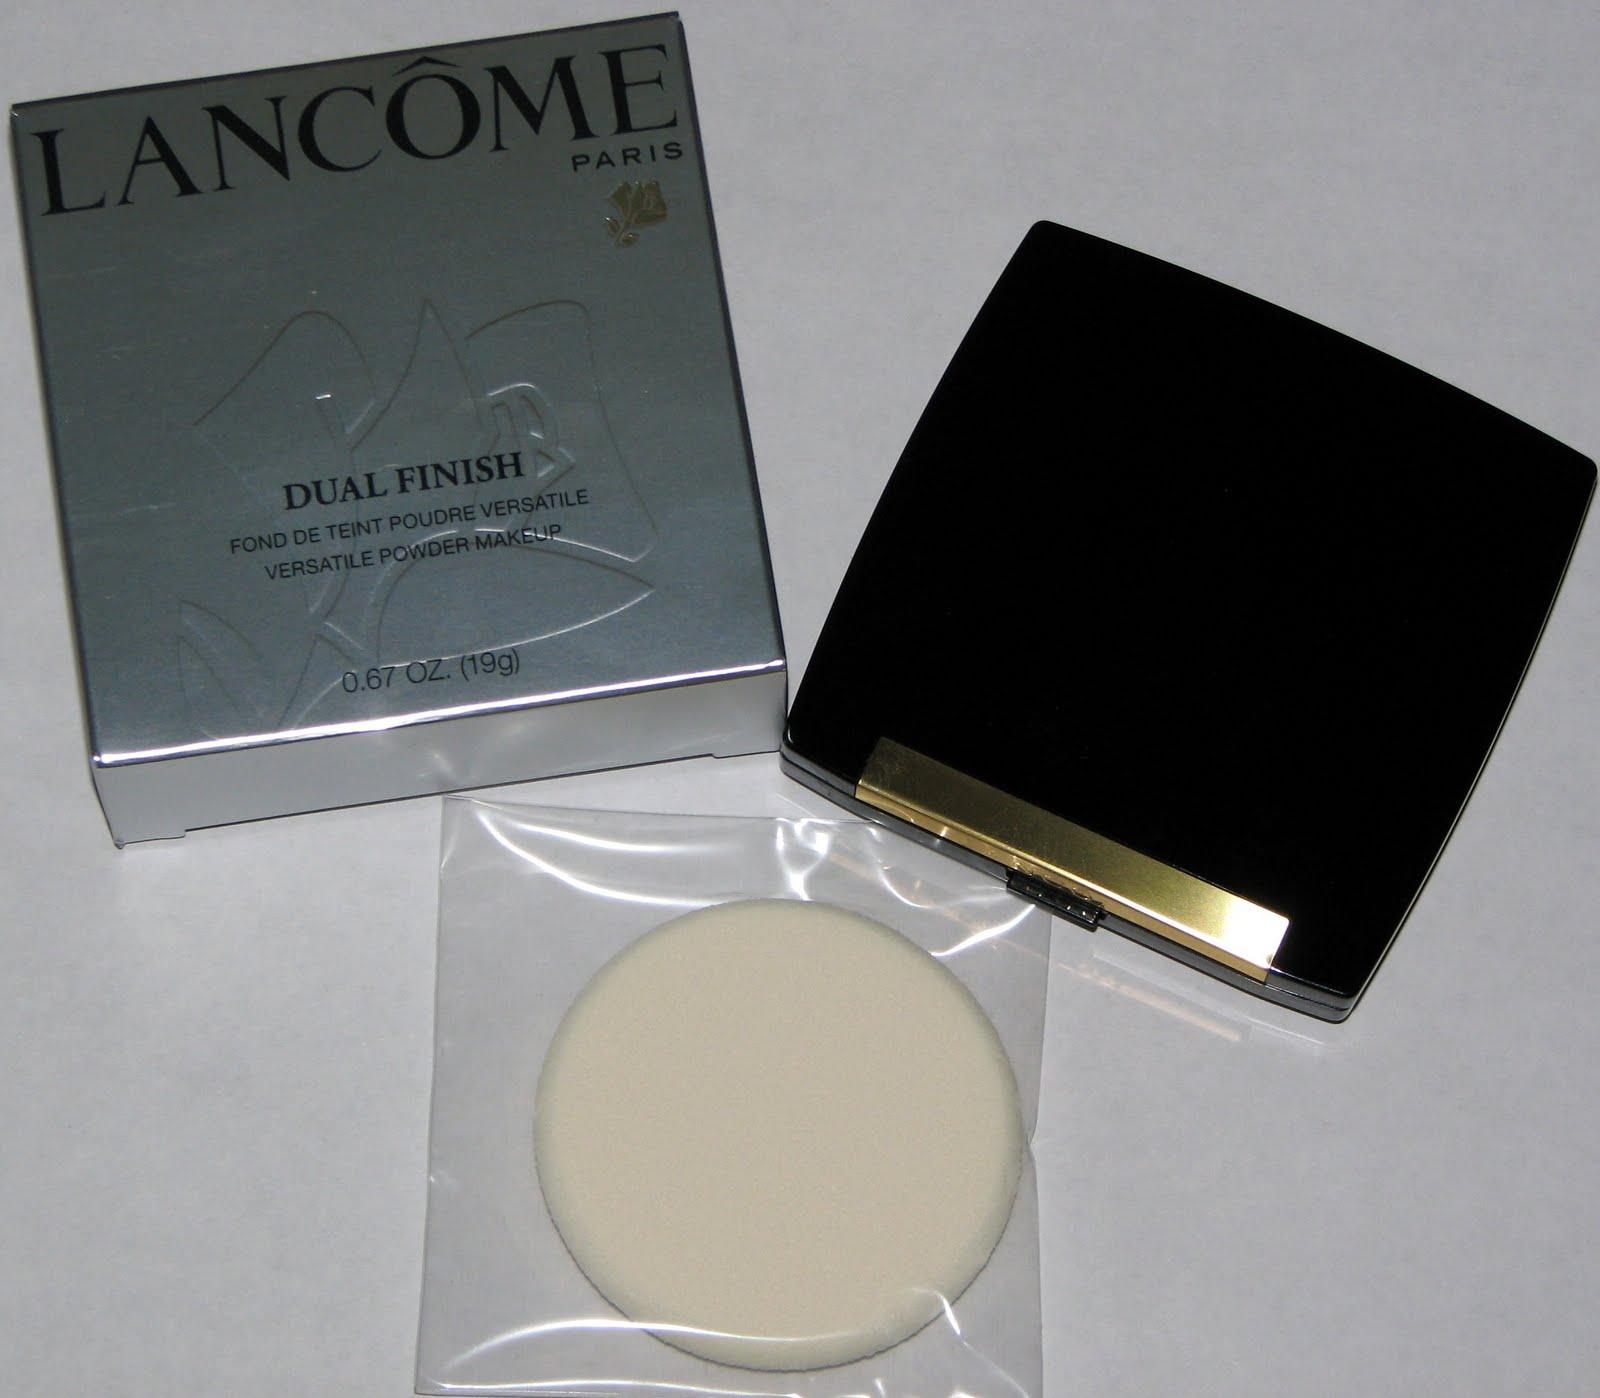 Spotlight on Lancome Dual Finish Powder - Blushing Noir